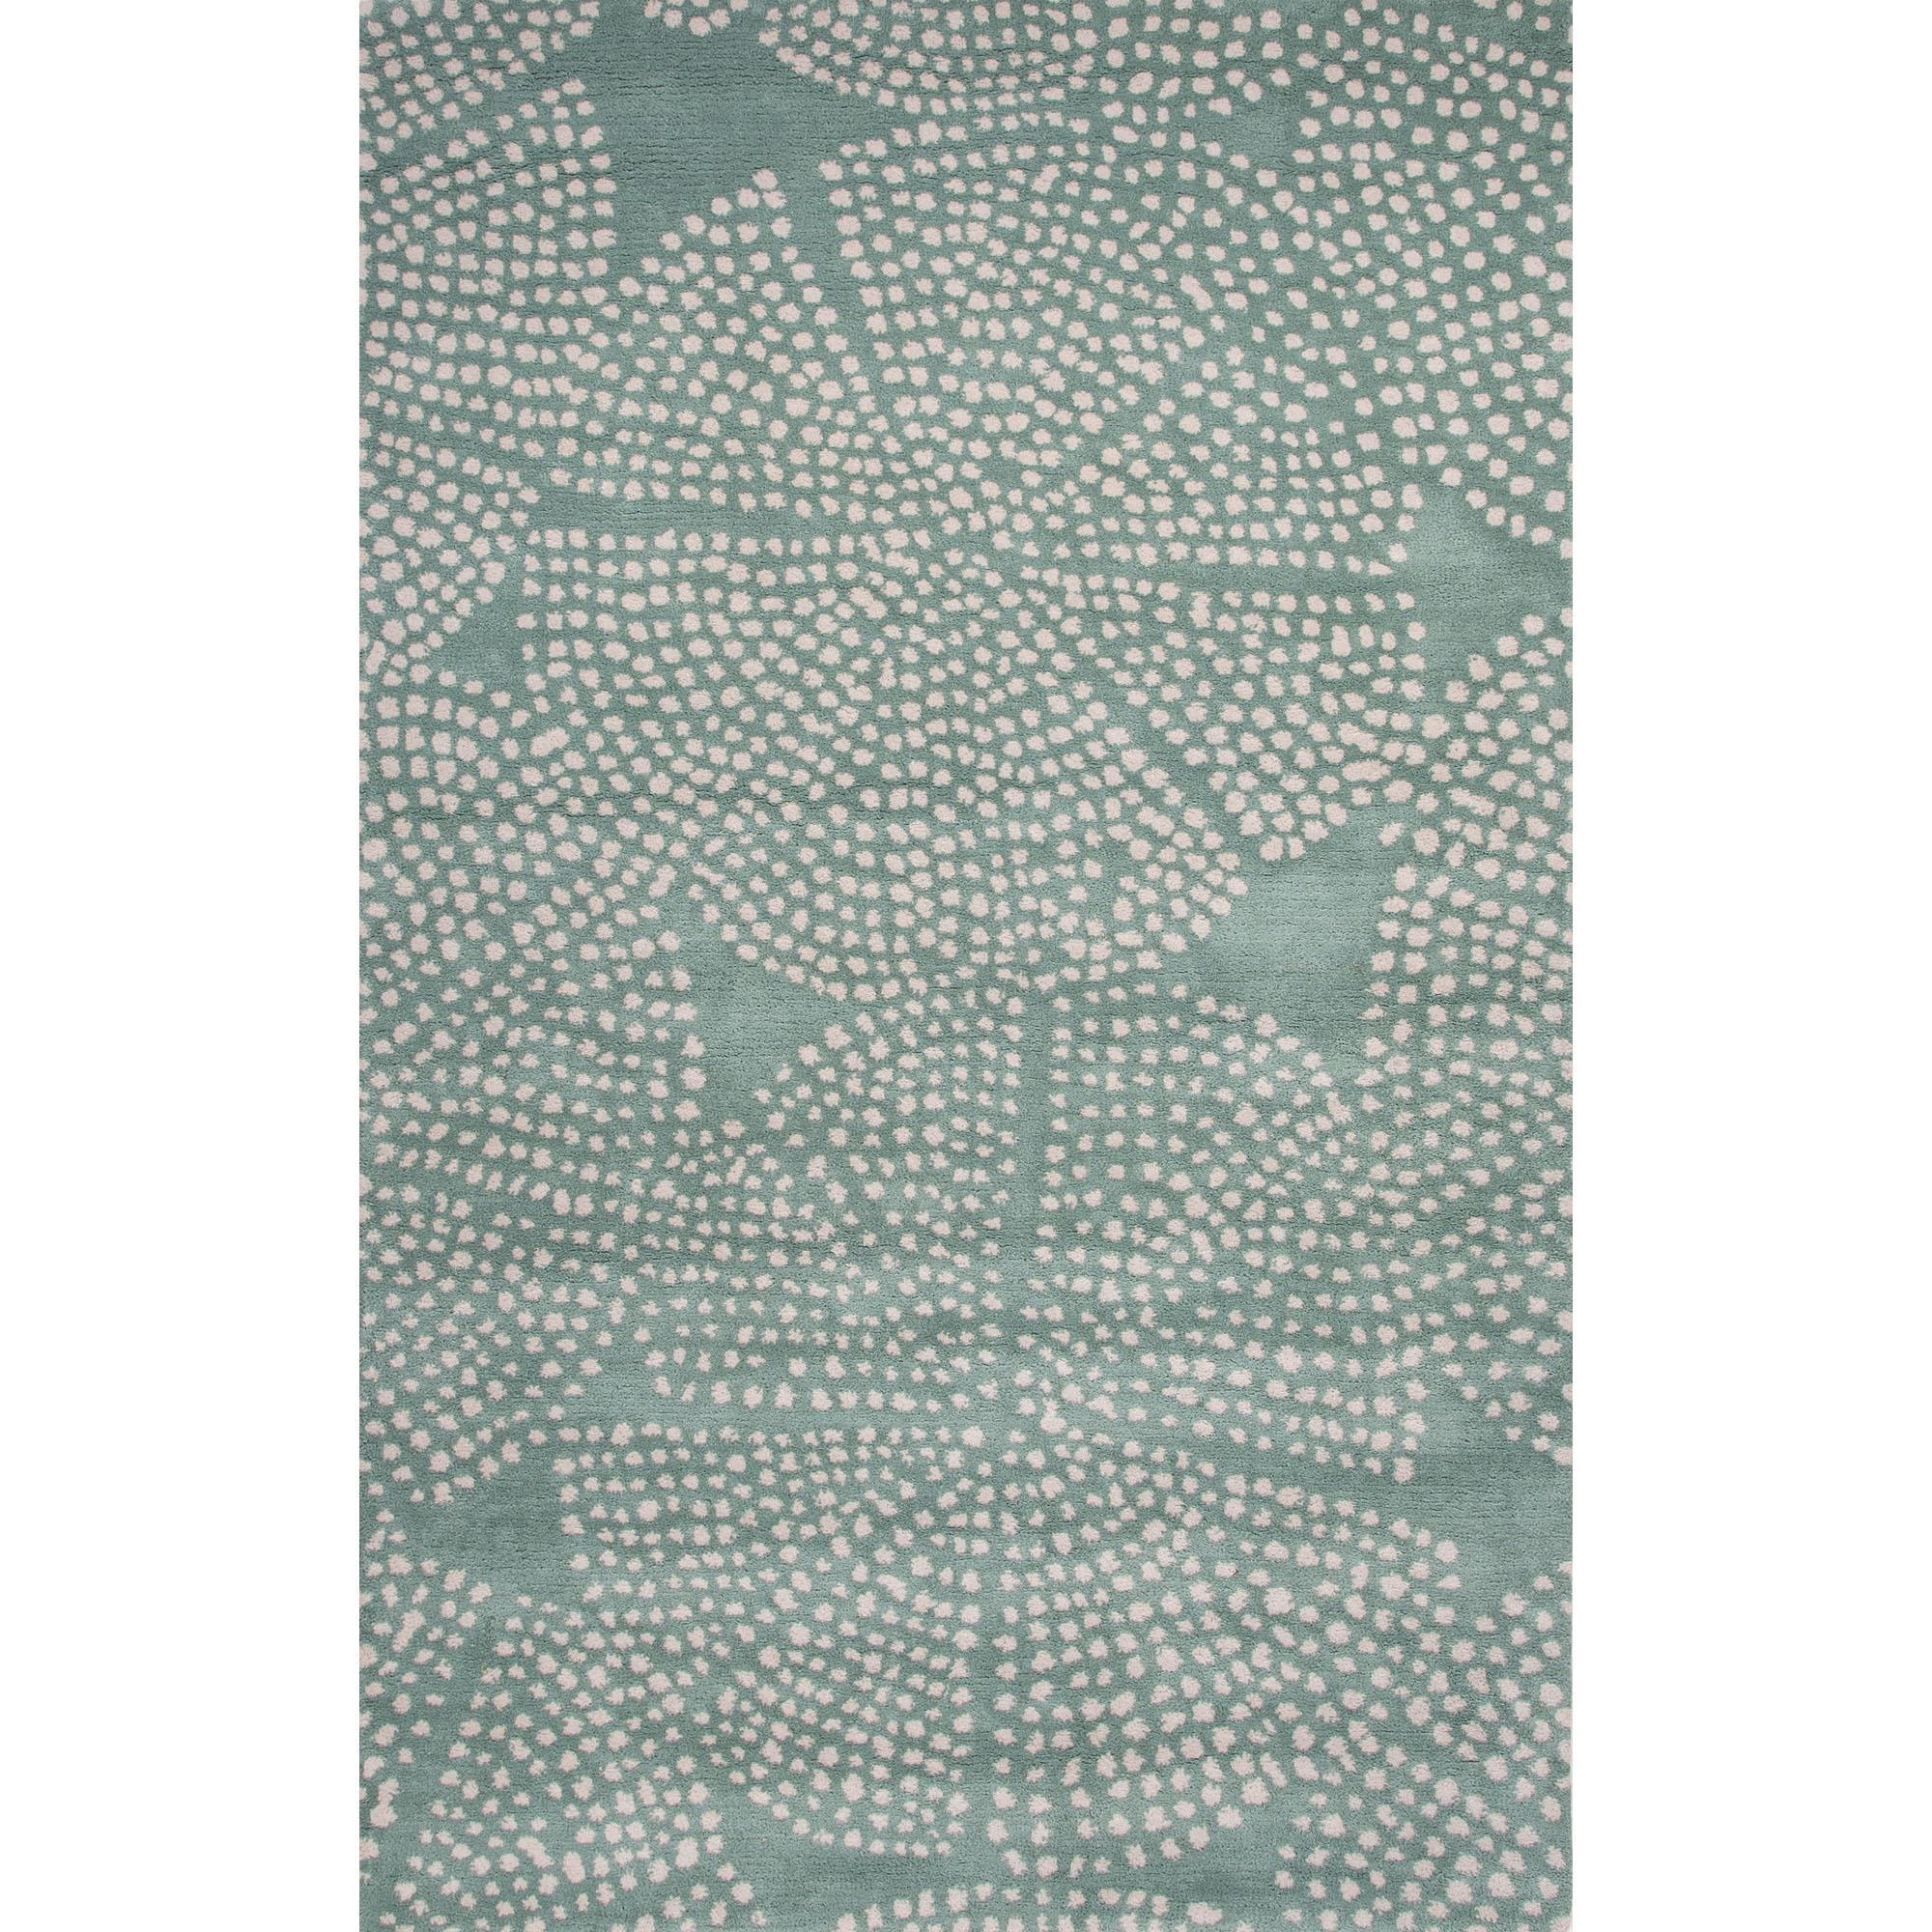 JAIPUR Rugs En Casa By Luli Sanchez Tufted 2 x 3 Rug - Item Number: RUG118156